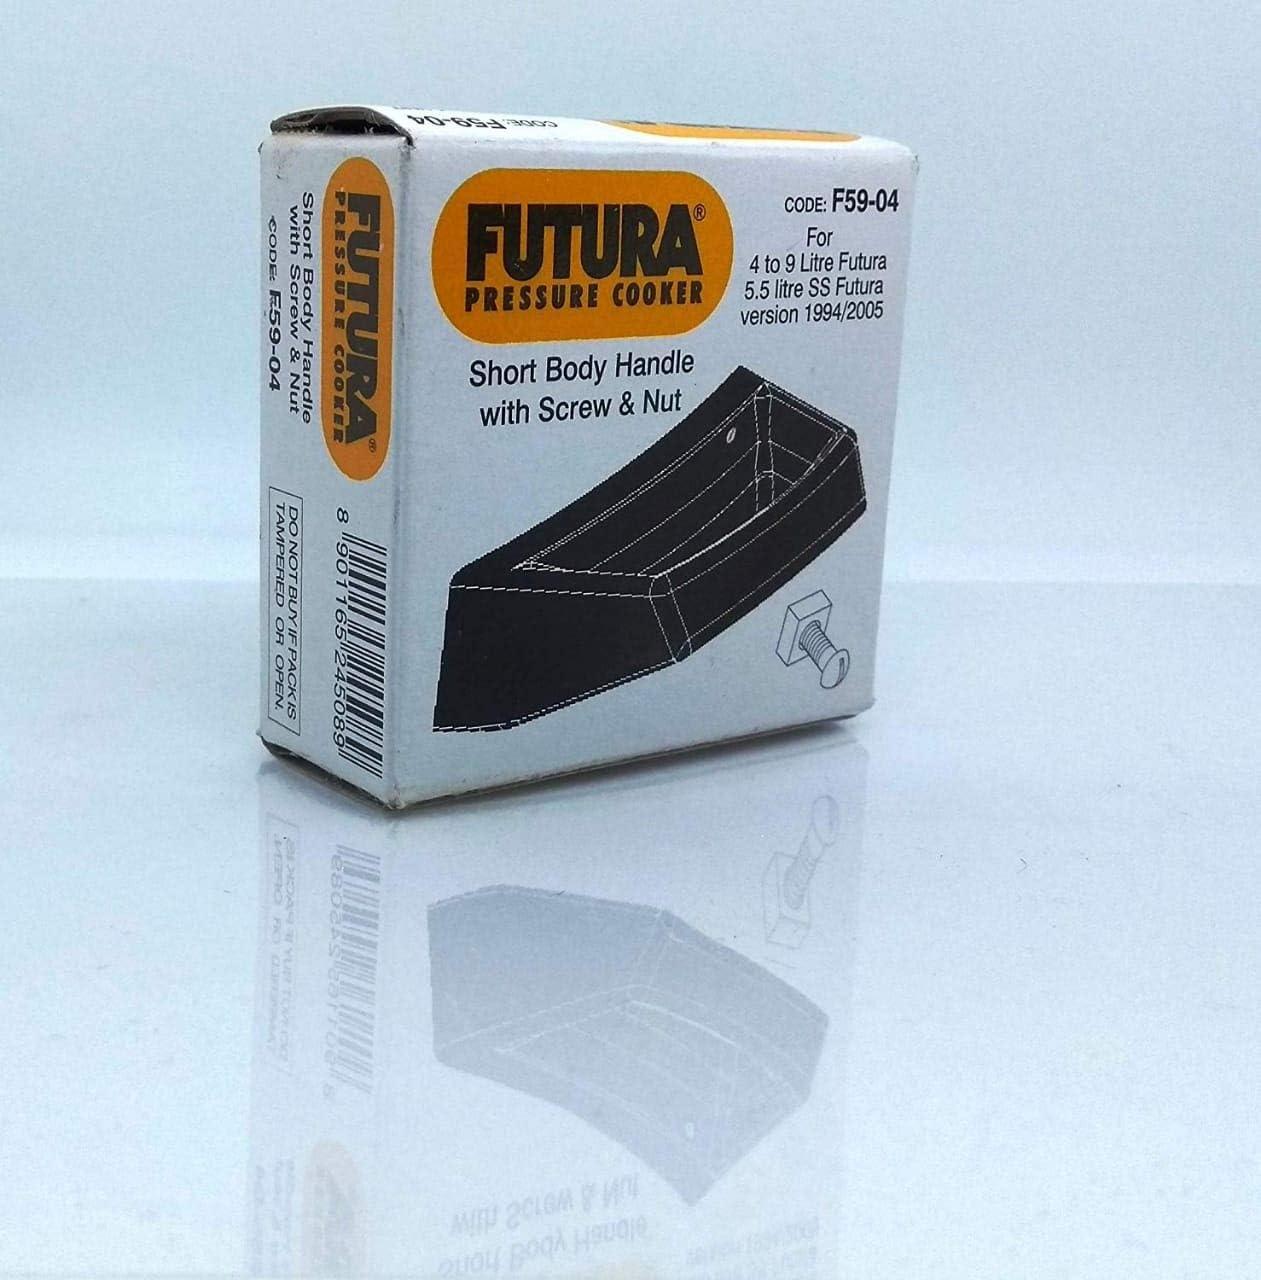 Futura Pressure Cooker Short Body Handle (Hawkins)